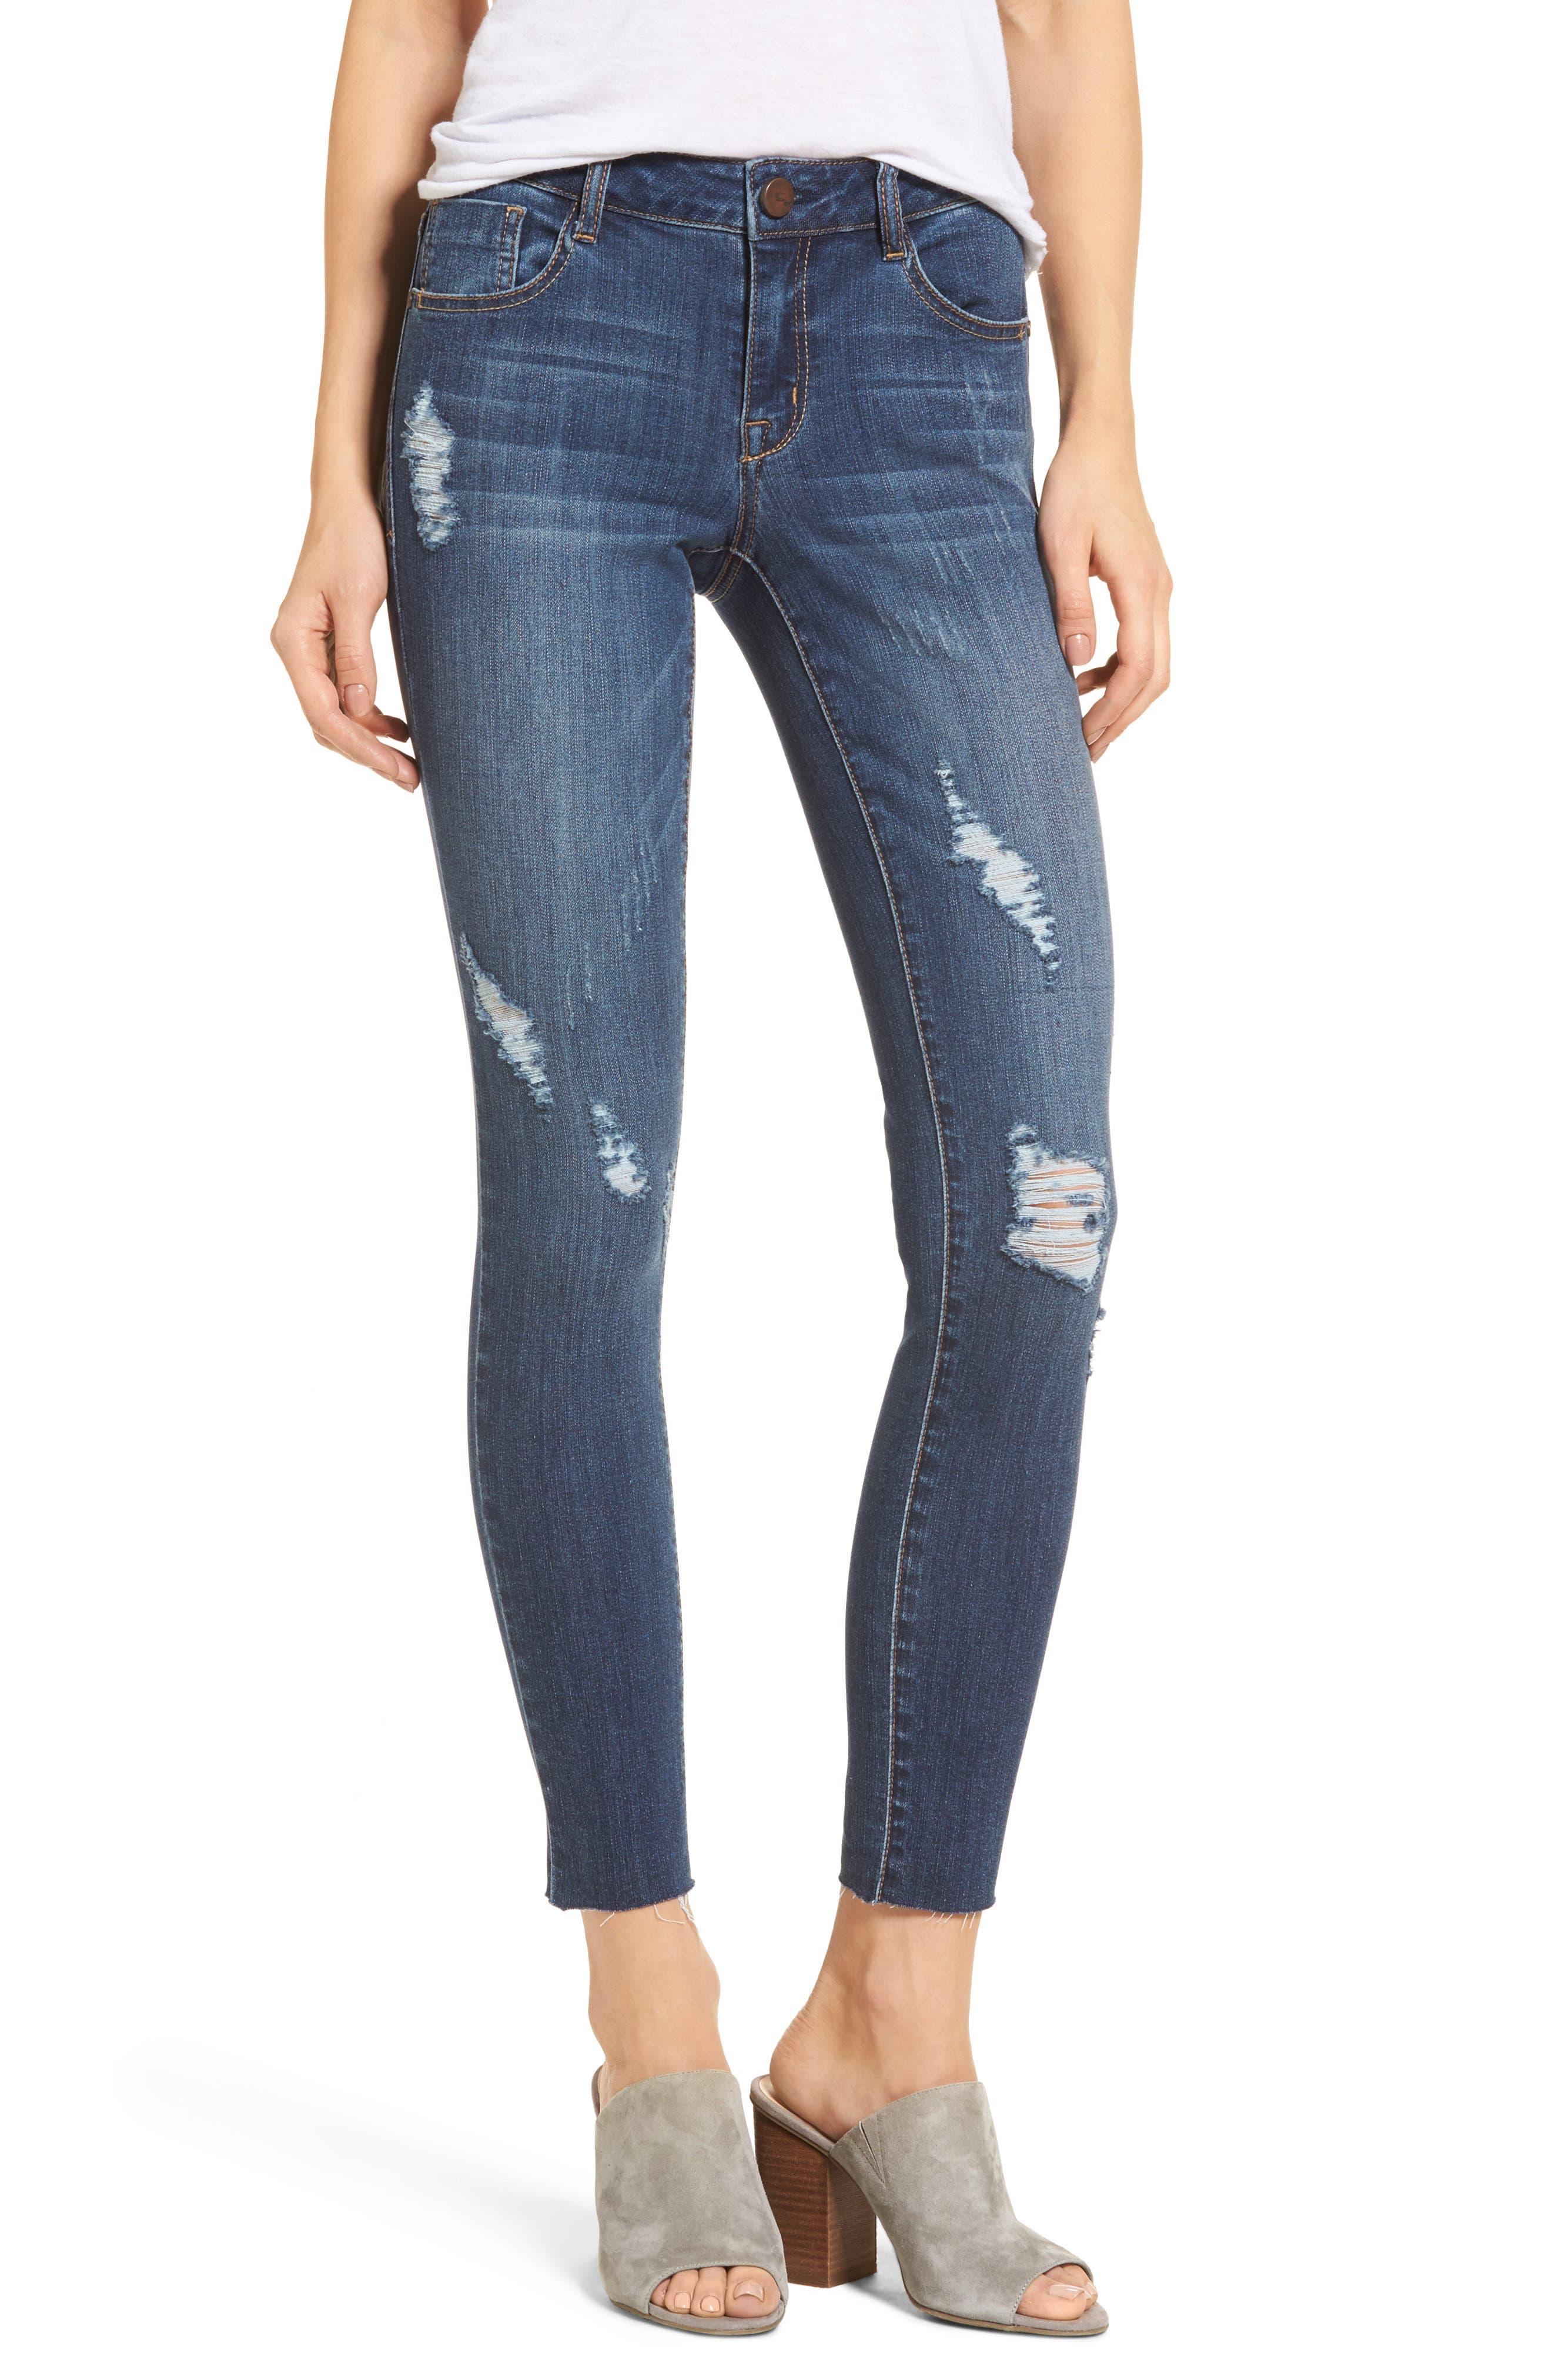 Skinny jeans under 50